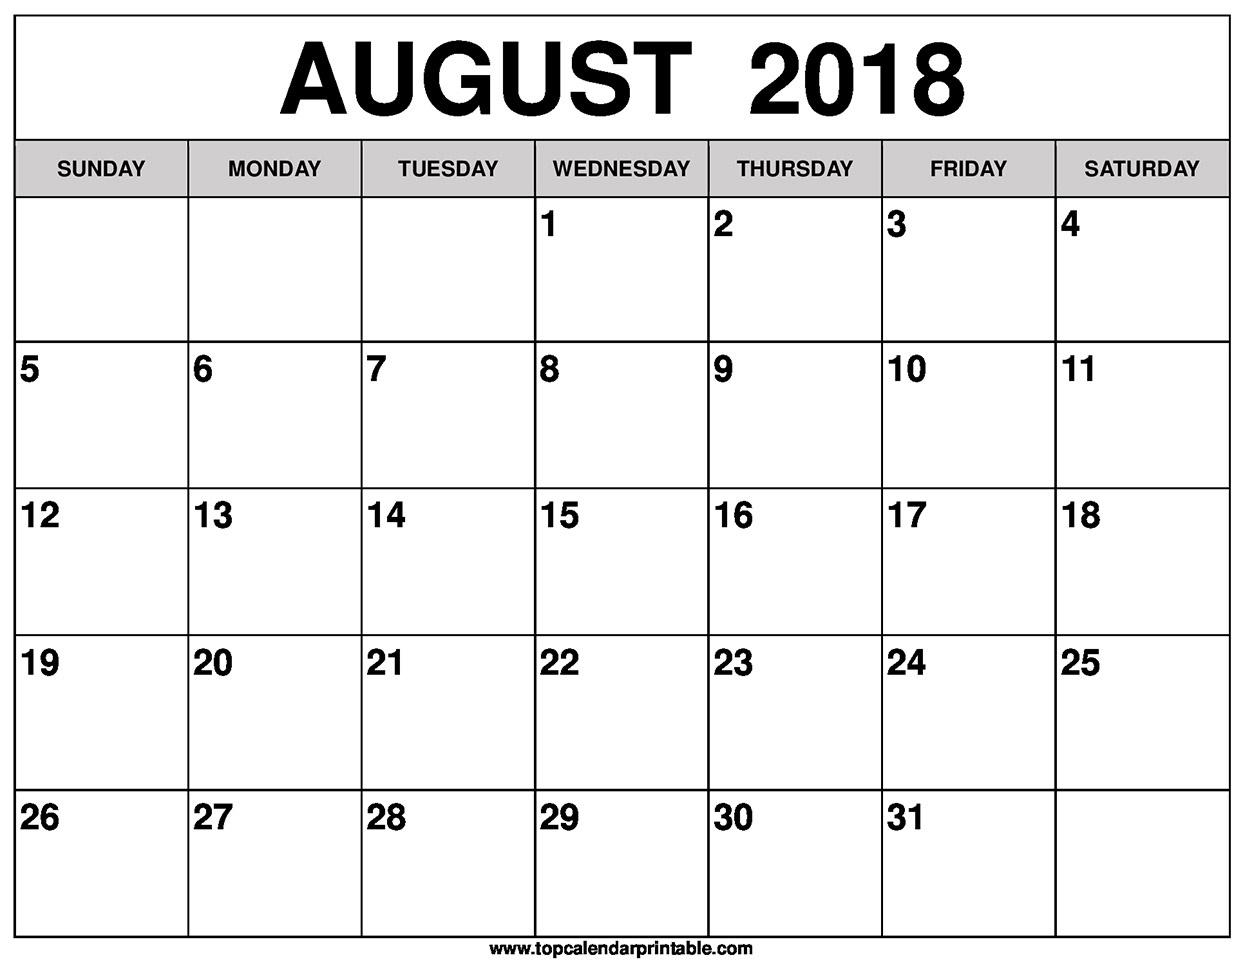 Blank August 2018 Calendar Printable  Picture Of August On Calendar